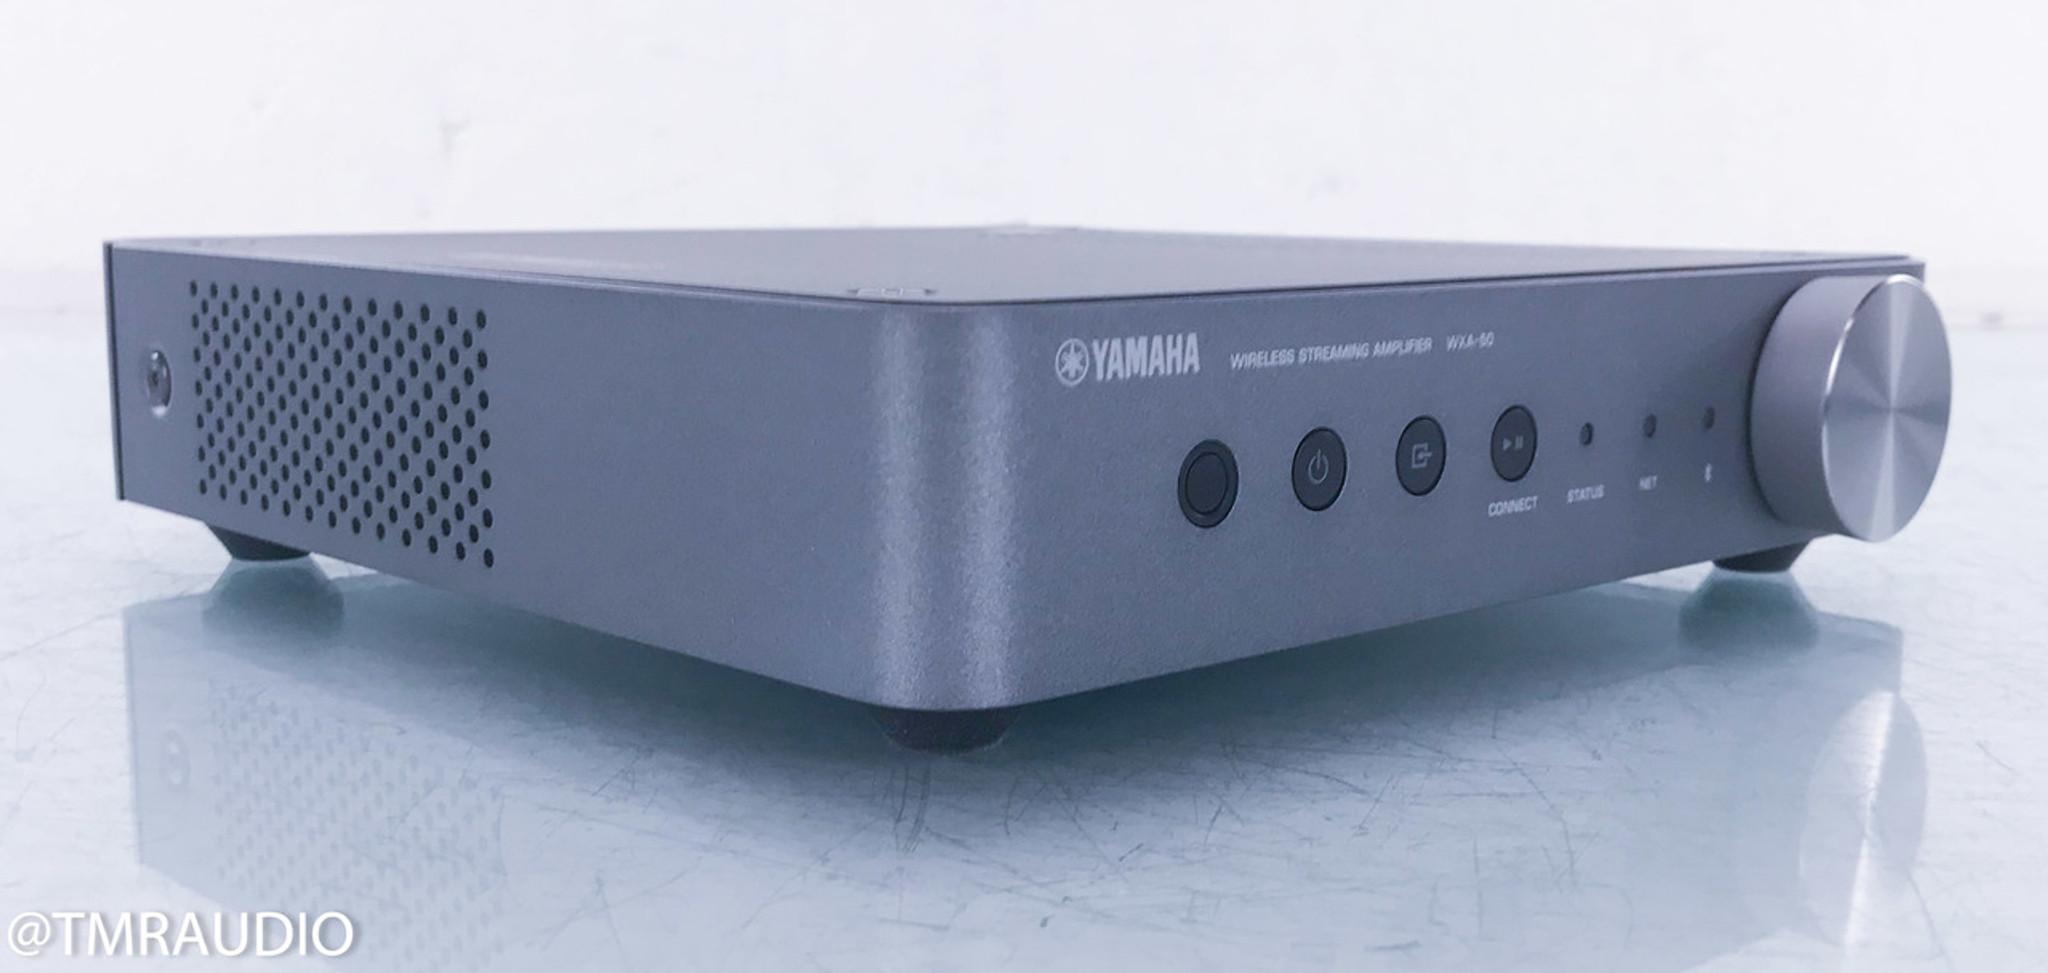 Yamaha Wxa 50 Stereo Integrated Amplifier Streamer Wi Fi Bluetooth Remote